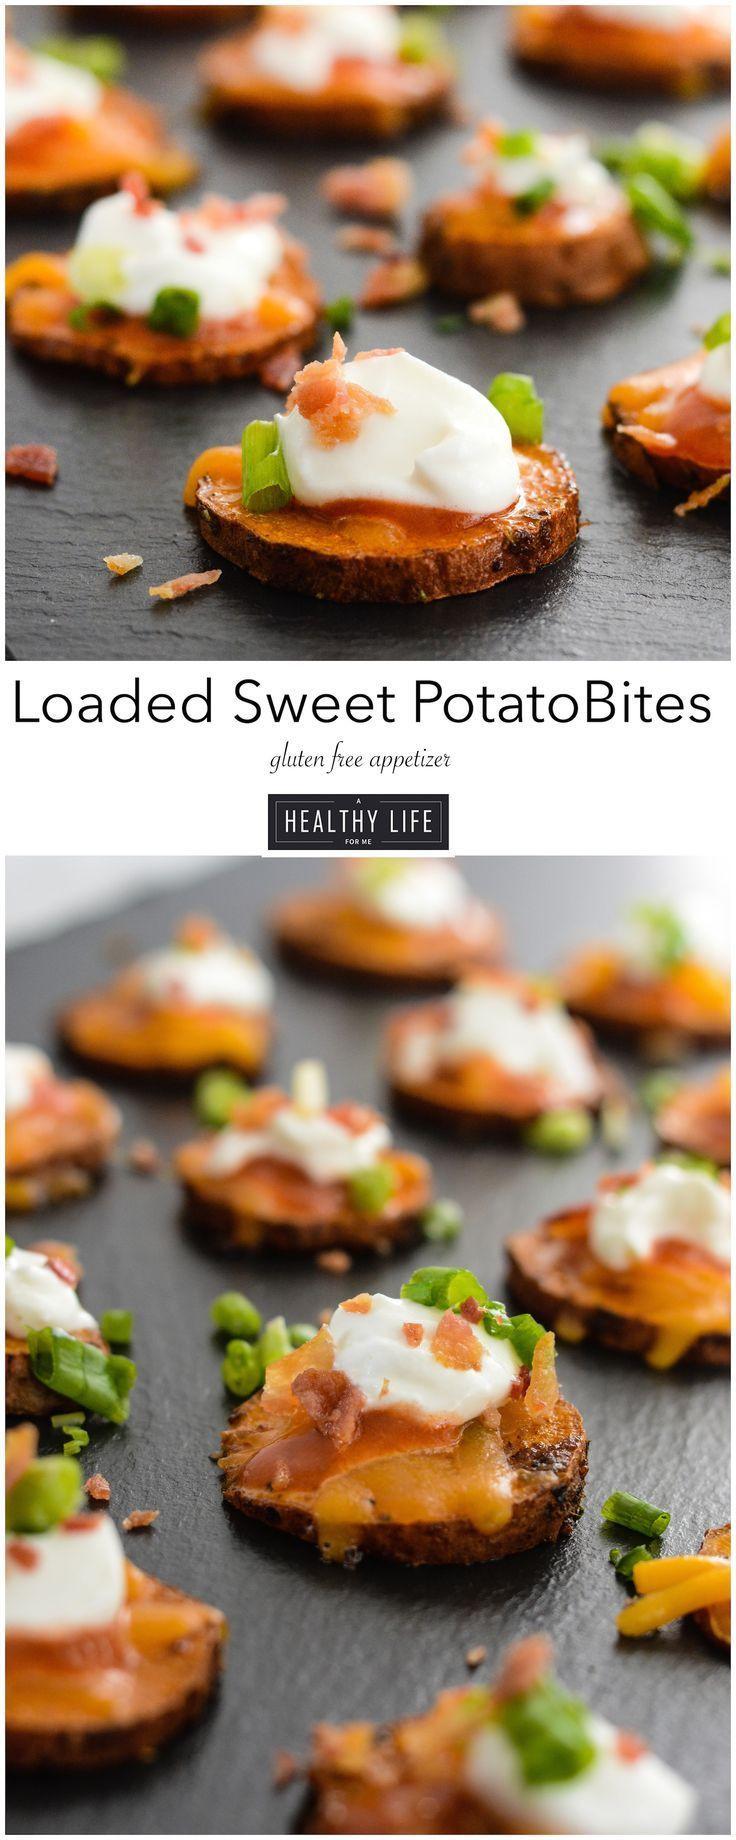 Light Thanksgiving Appetizers  Loaded Sweet Potato Bites Recipe